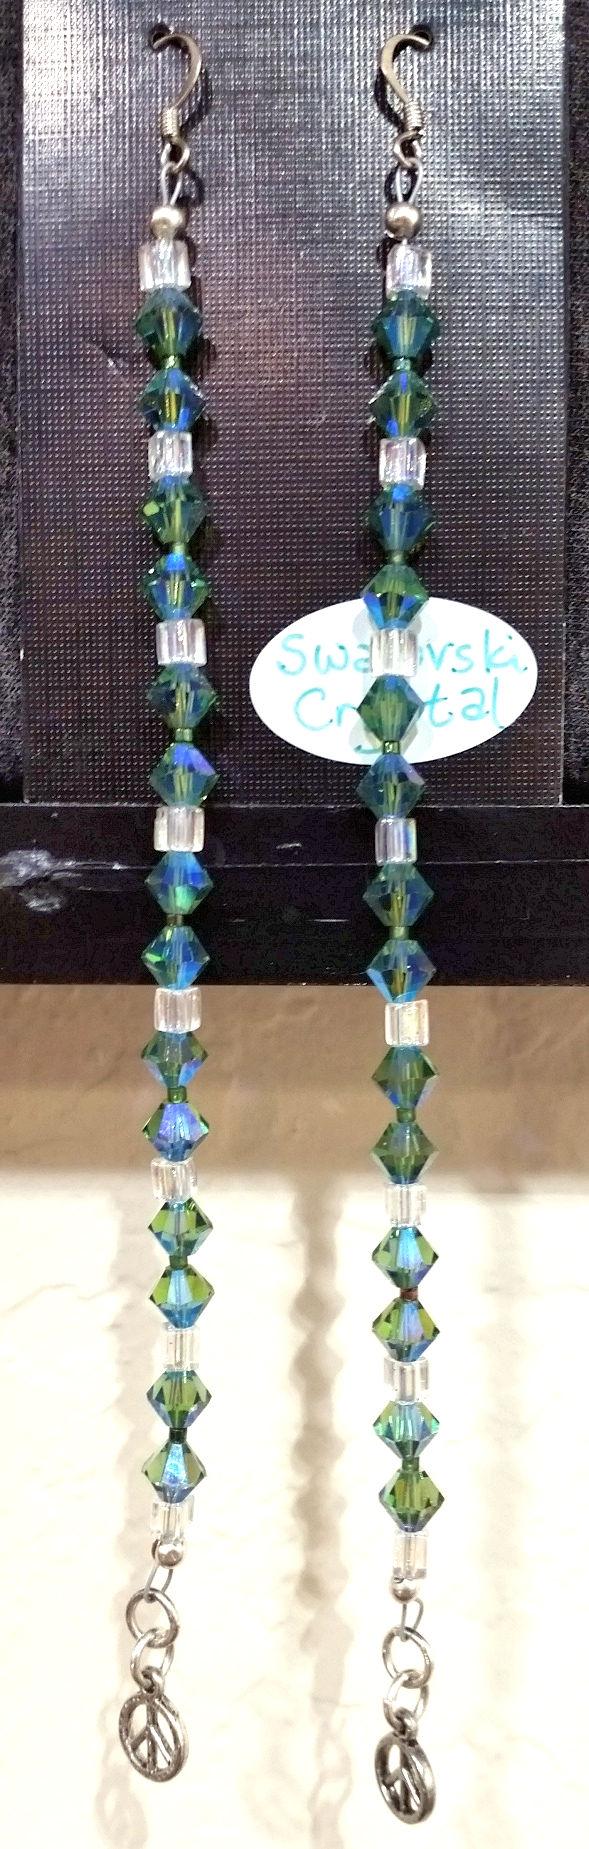 aqua swarovski earrings.jpg